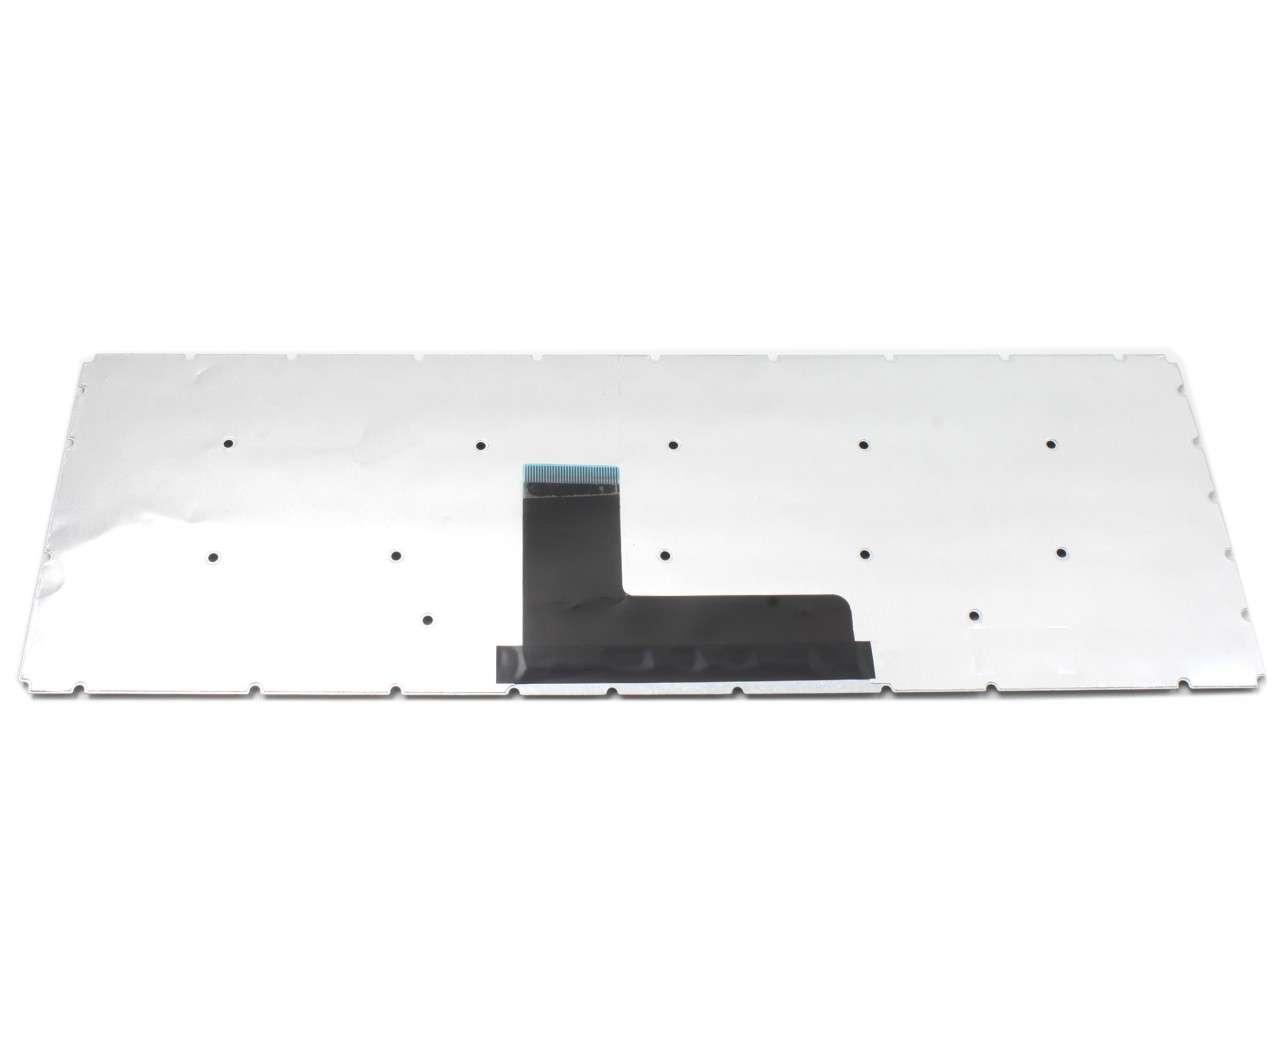 Tastatura Toshiba Satellite L50 B5271 layout US fara rama enter mic imagine powerlaptop.ro 2021